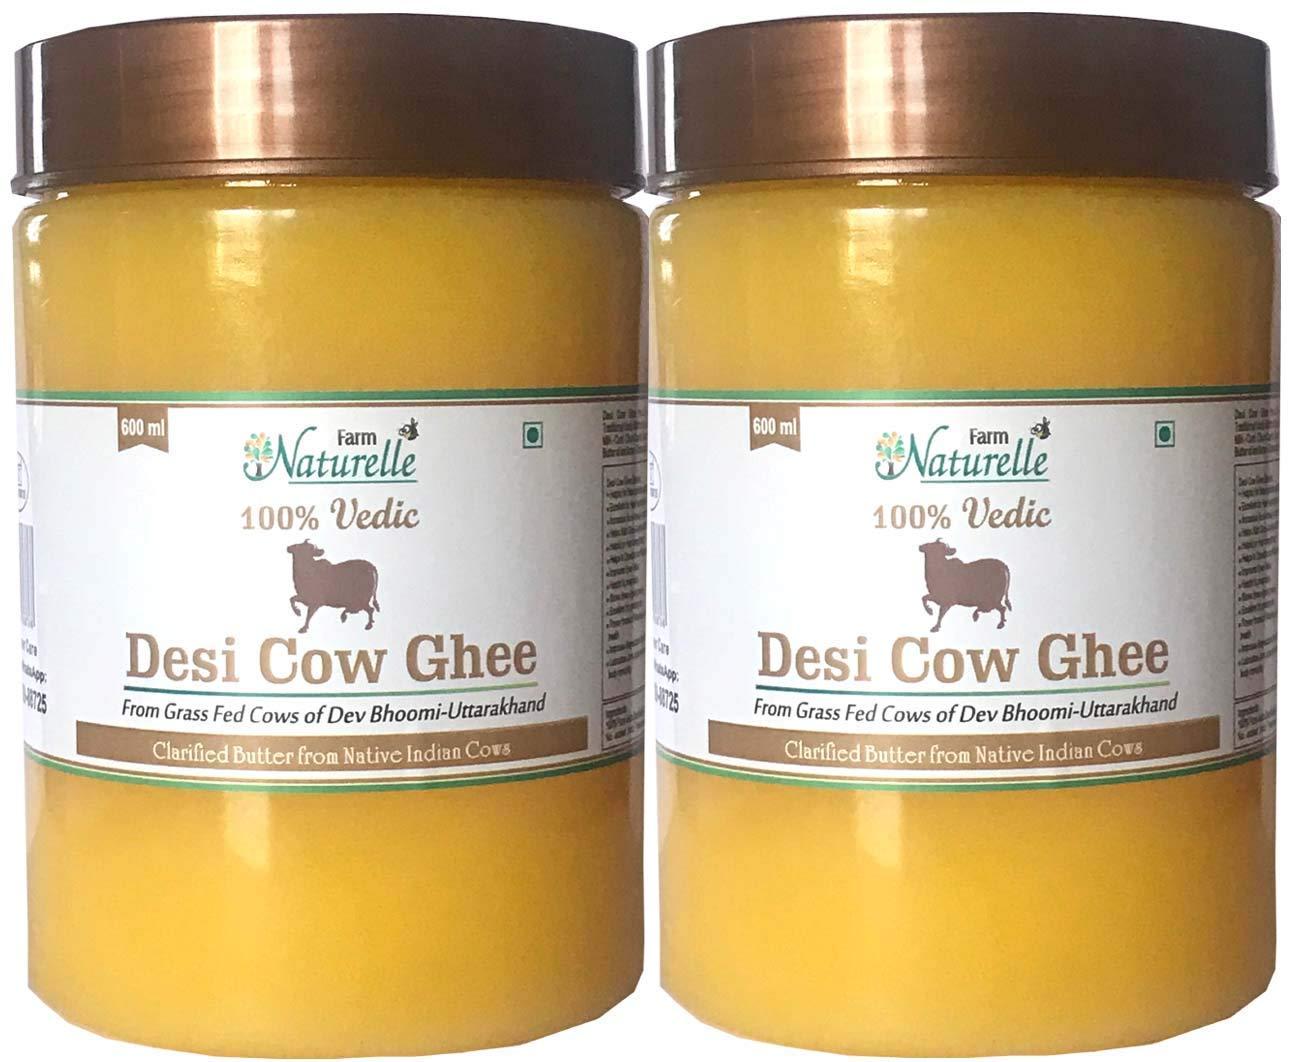 Farm Naturelle Desi Cow Ghee (Pack of 2) - 100% Pure From A2 Milk - 600 ML X 2 (20.28oz)